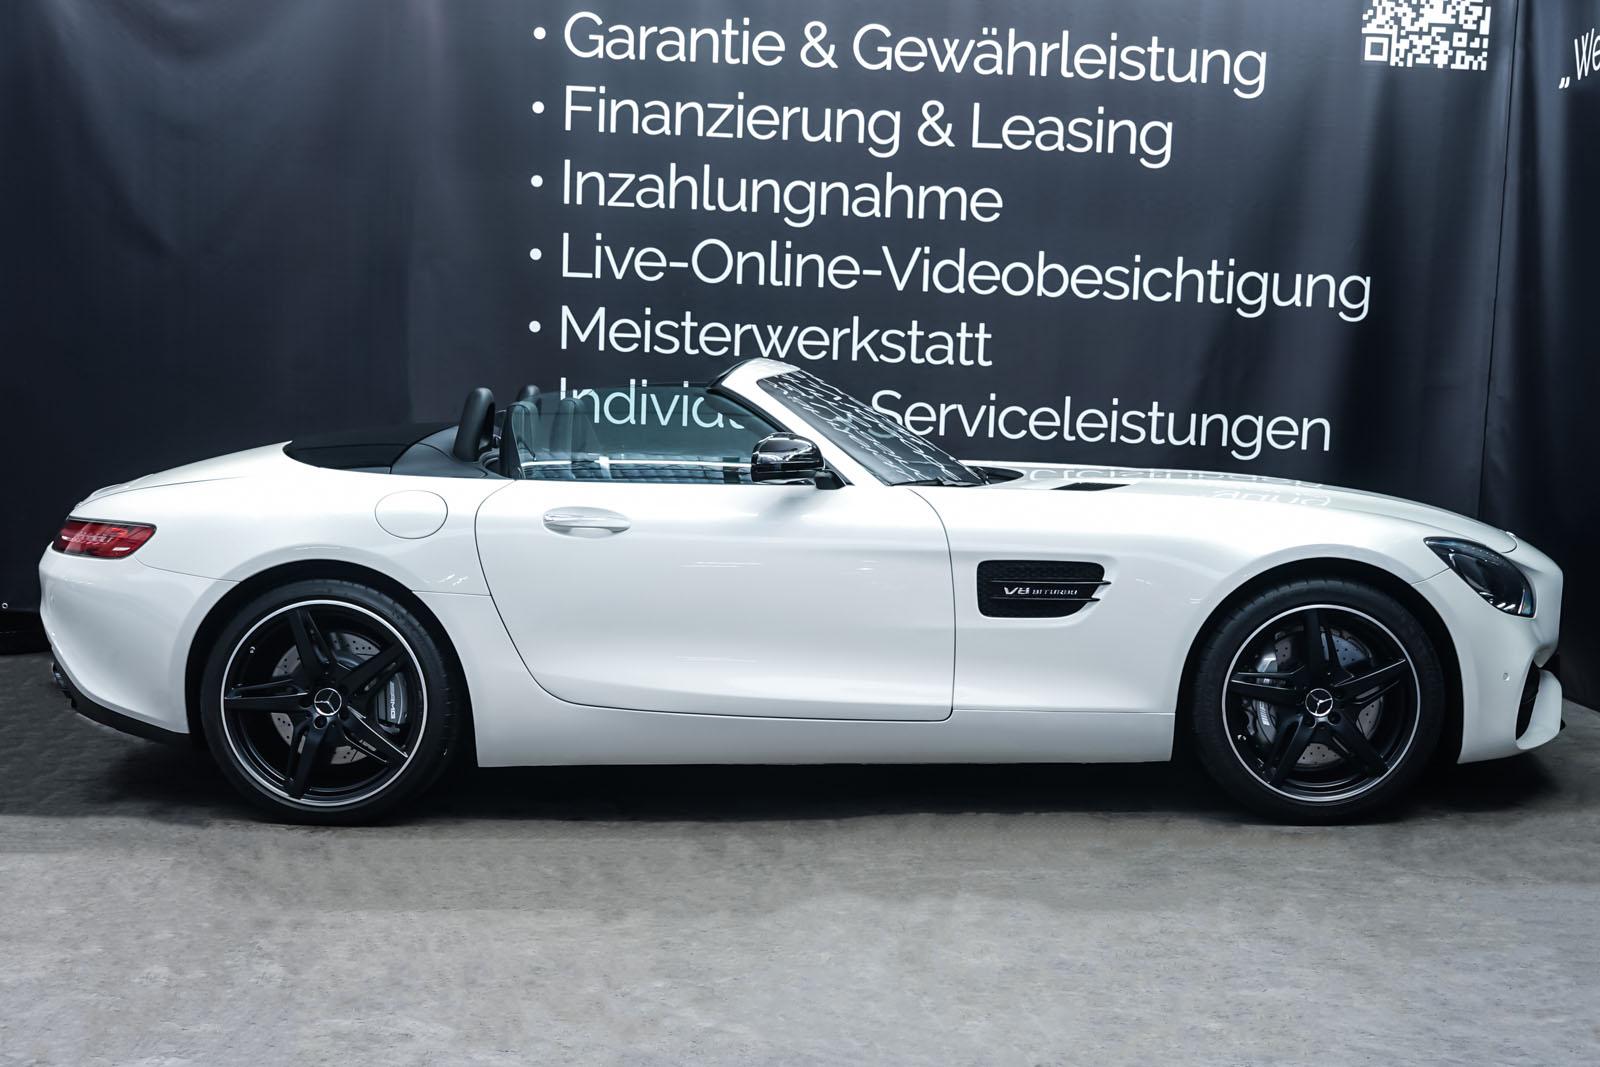 11Mercedes_Benz_AMG_GT_Roadster_Weiss_Schwarz_MB-9710_21_w